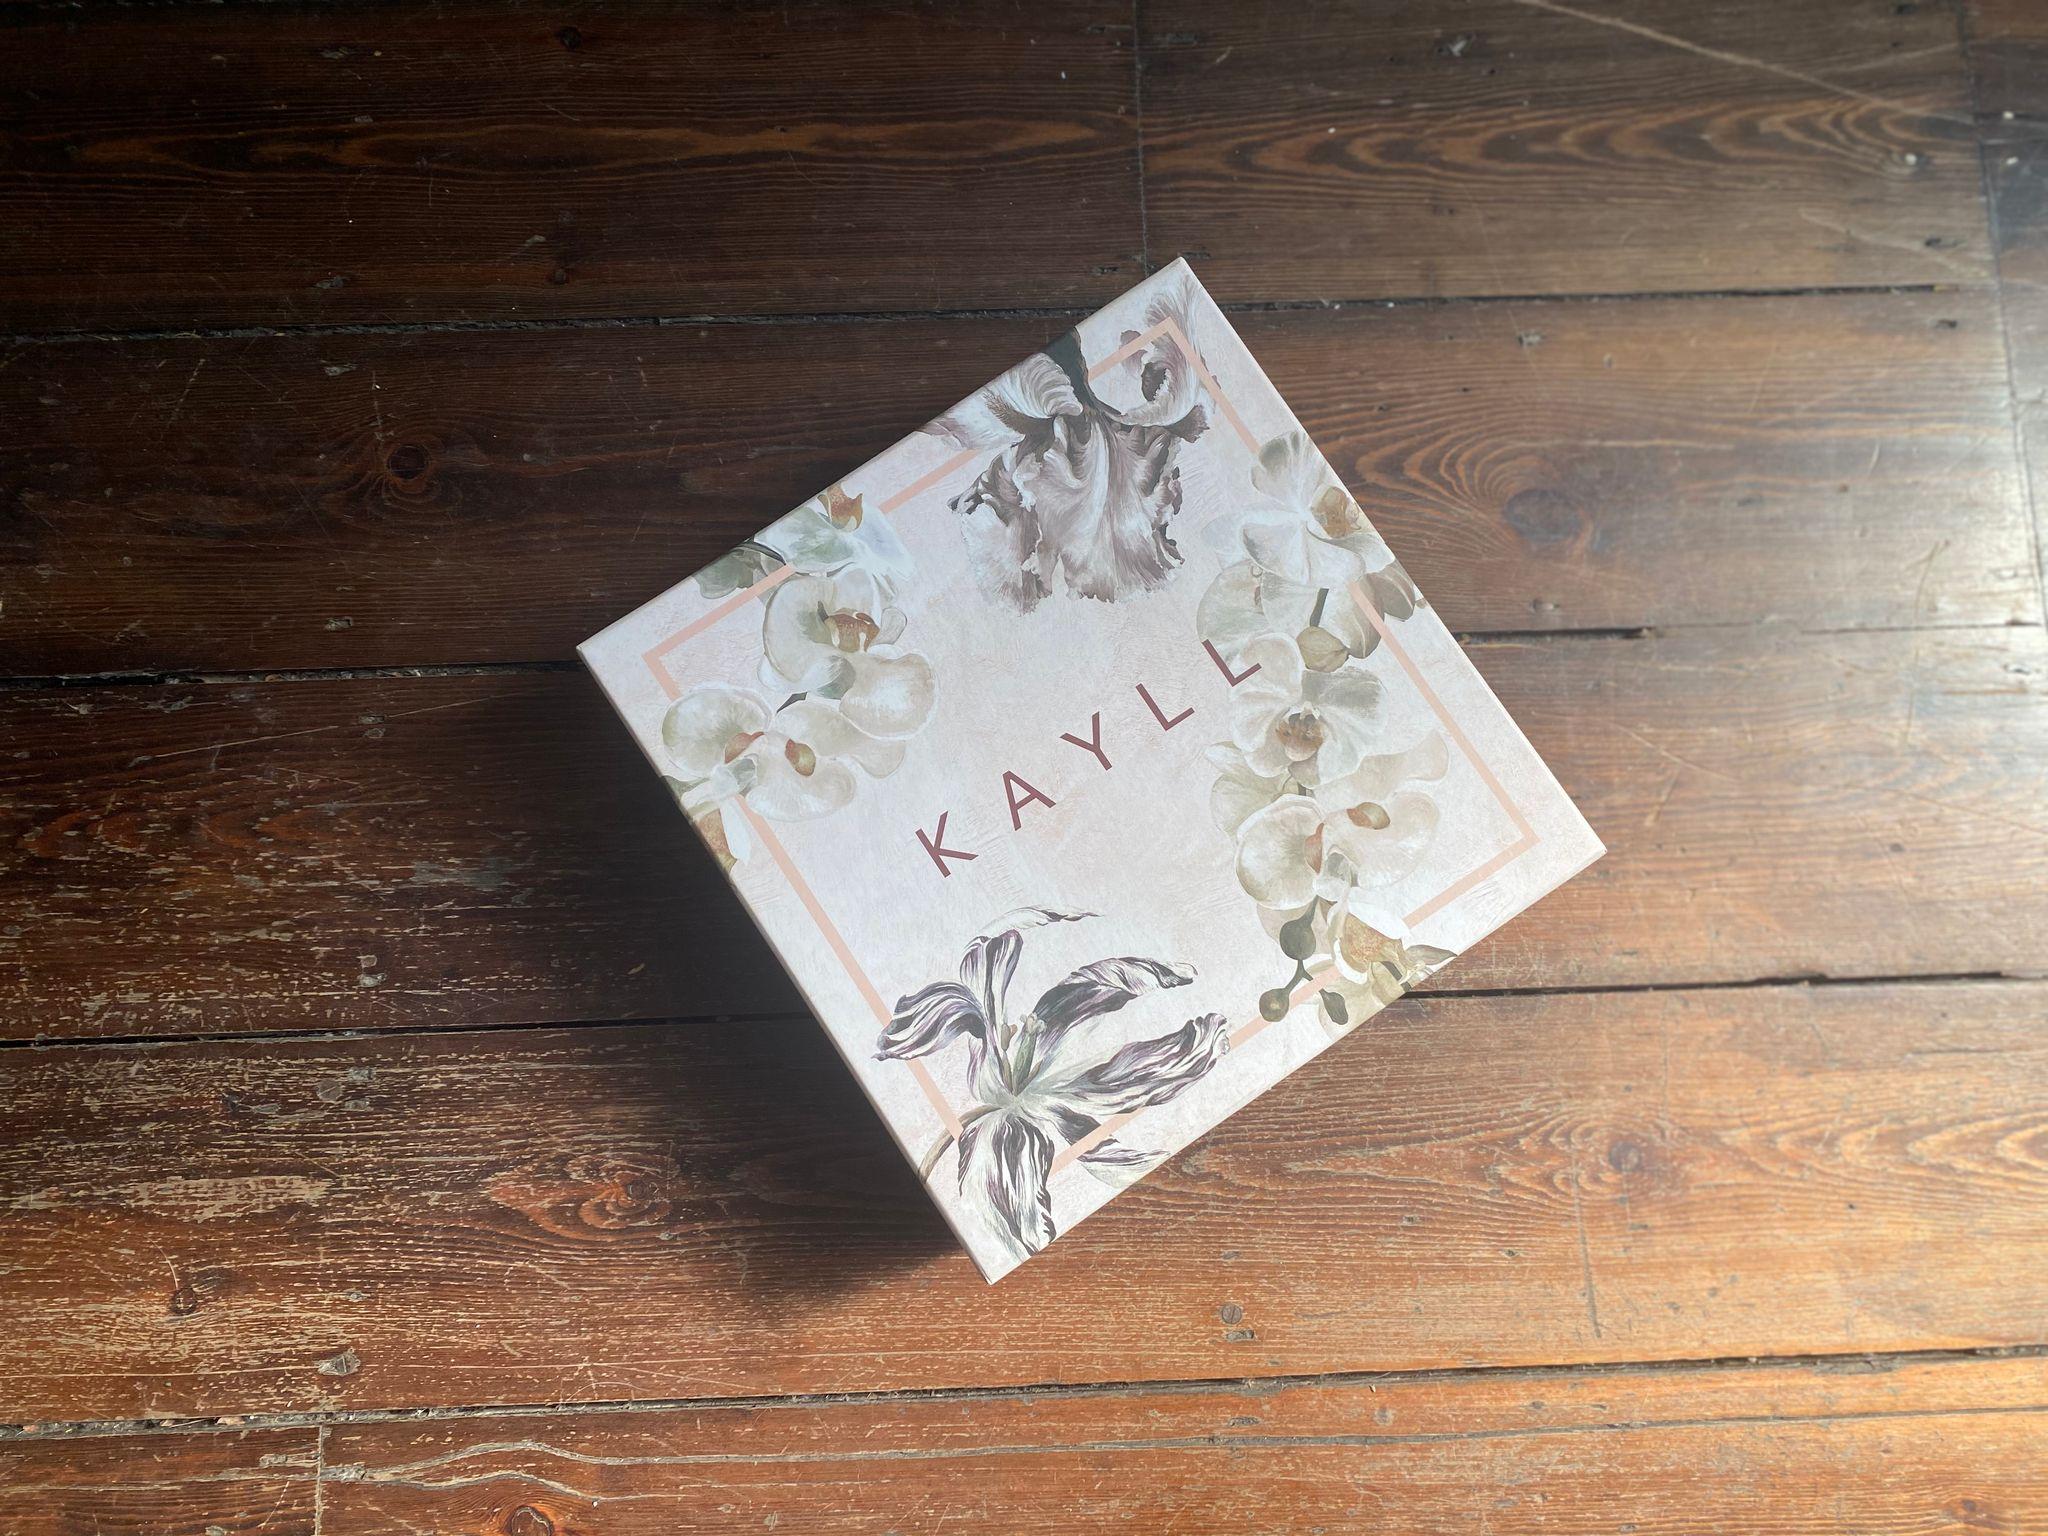 Kayll silk kimonos